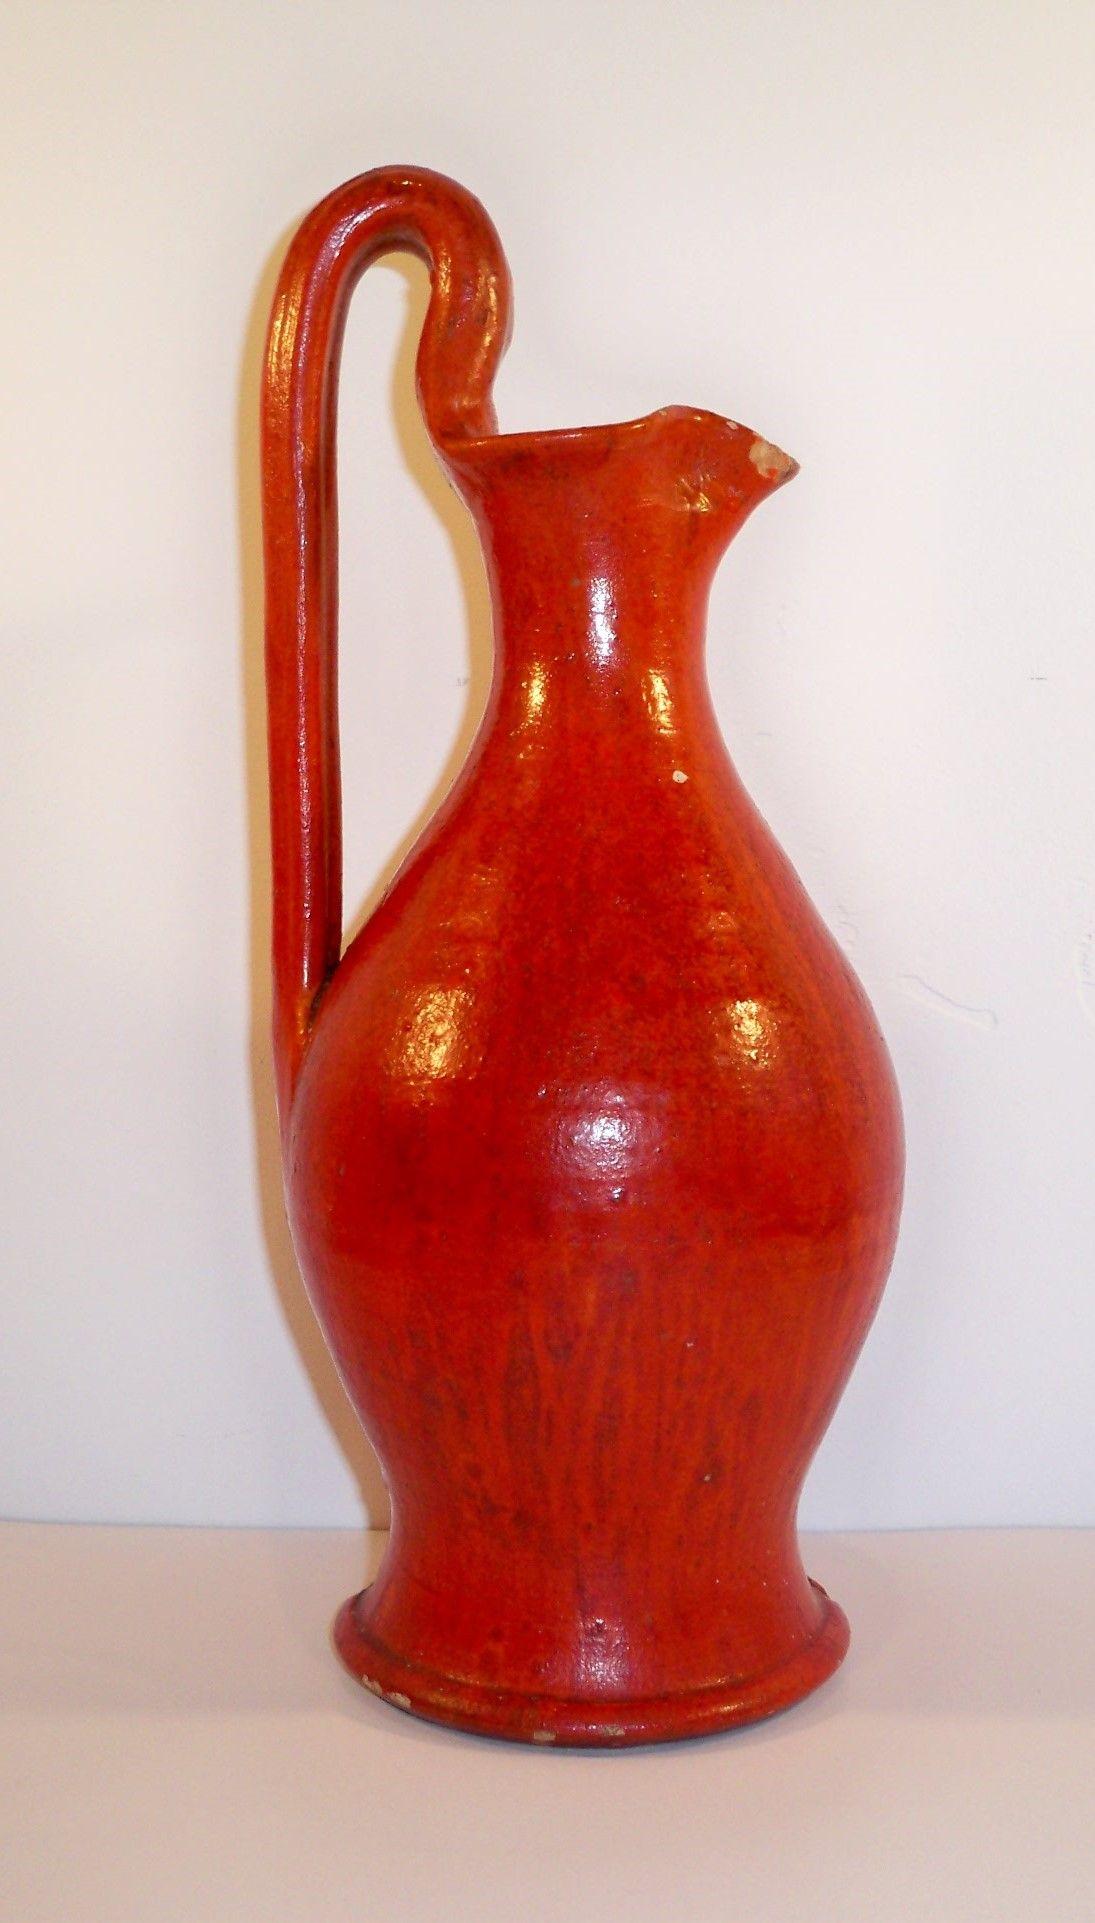 Attr Ar Cole Chrome Red Rebekah Pitcher Folk Pottery Ceramic Art Art Museum